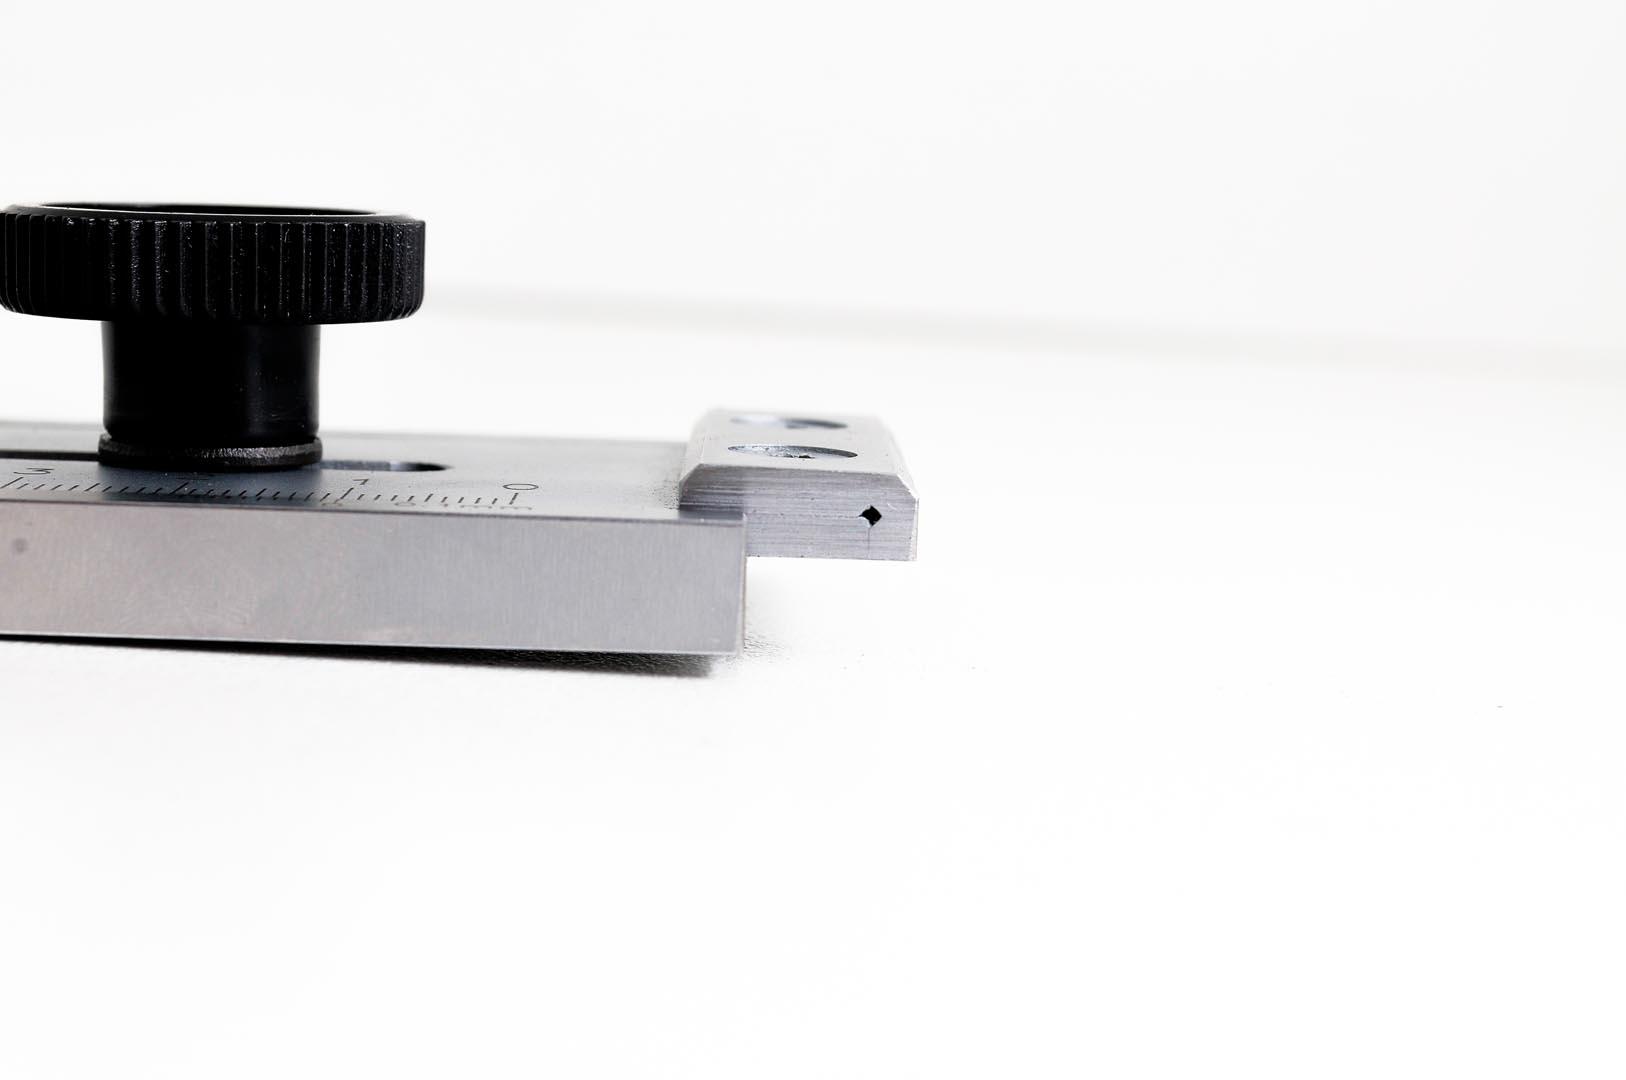 7120-200A-Gramil regla de precision para marcar 0-200mm INSIZE 7120-200A-max-4.